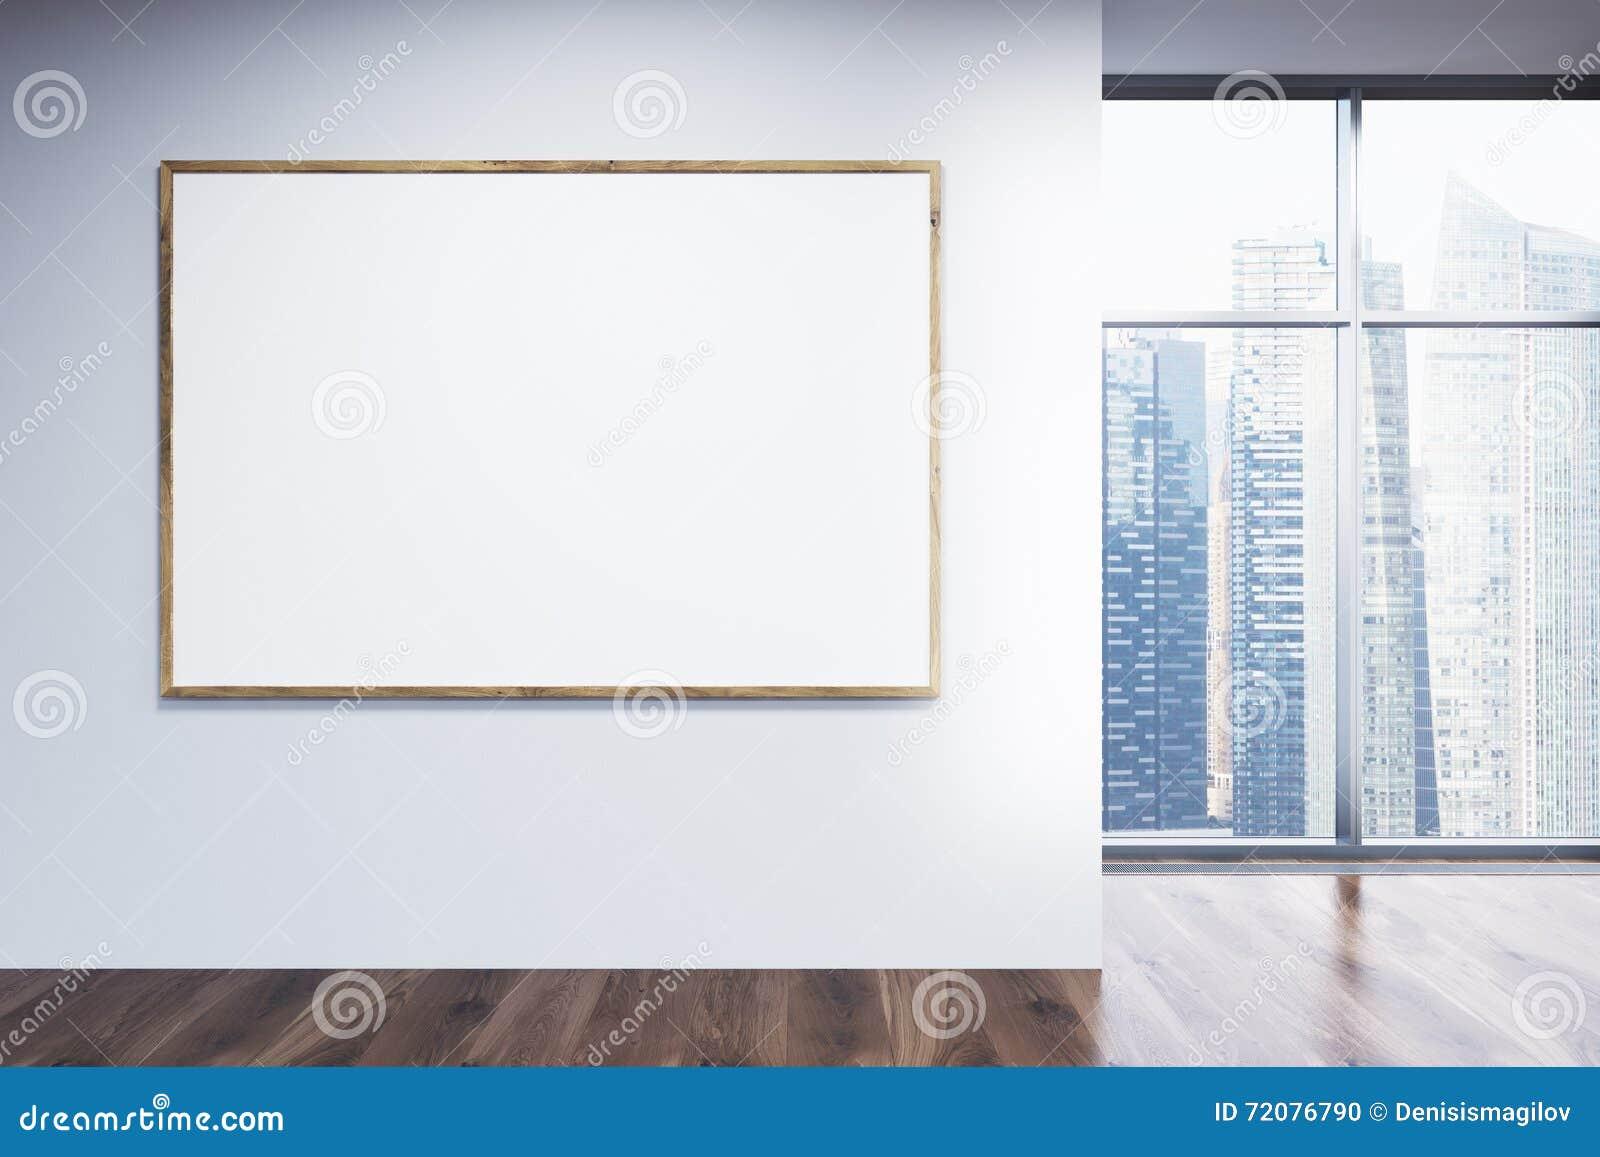 Blank Picture Frame In Room Stock Illustration - Illustration of ...